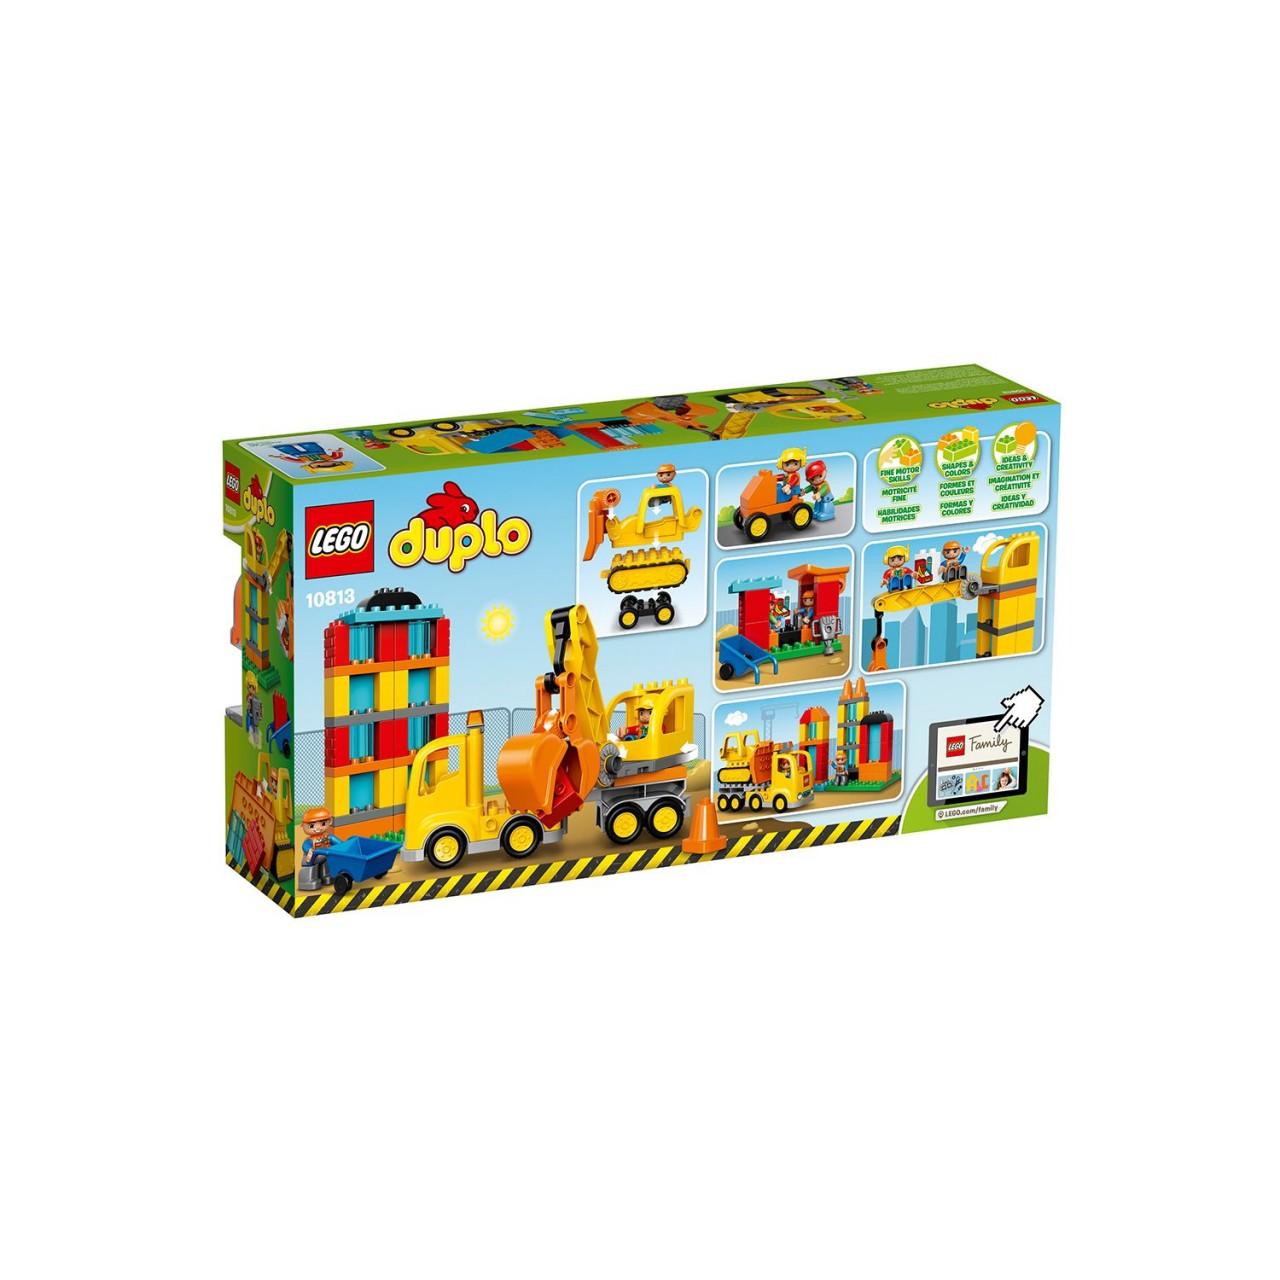 LEGO DUPLO 10813 Große Baustelle